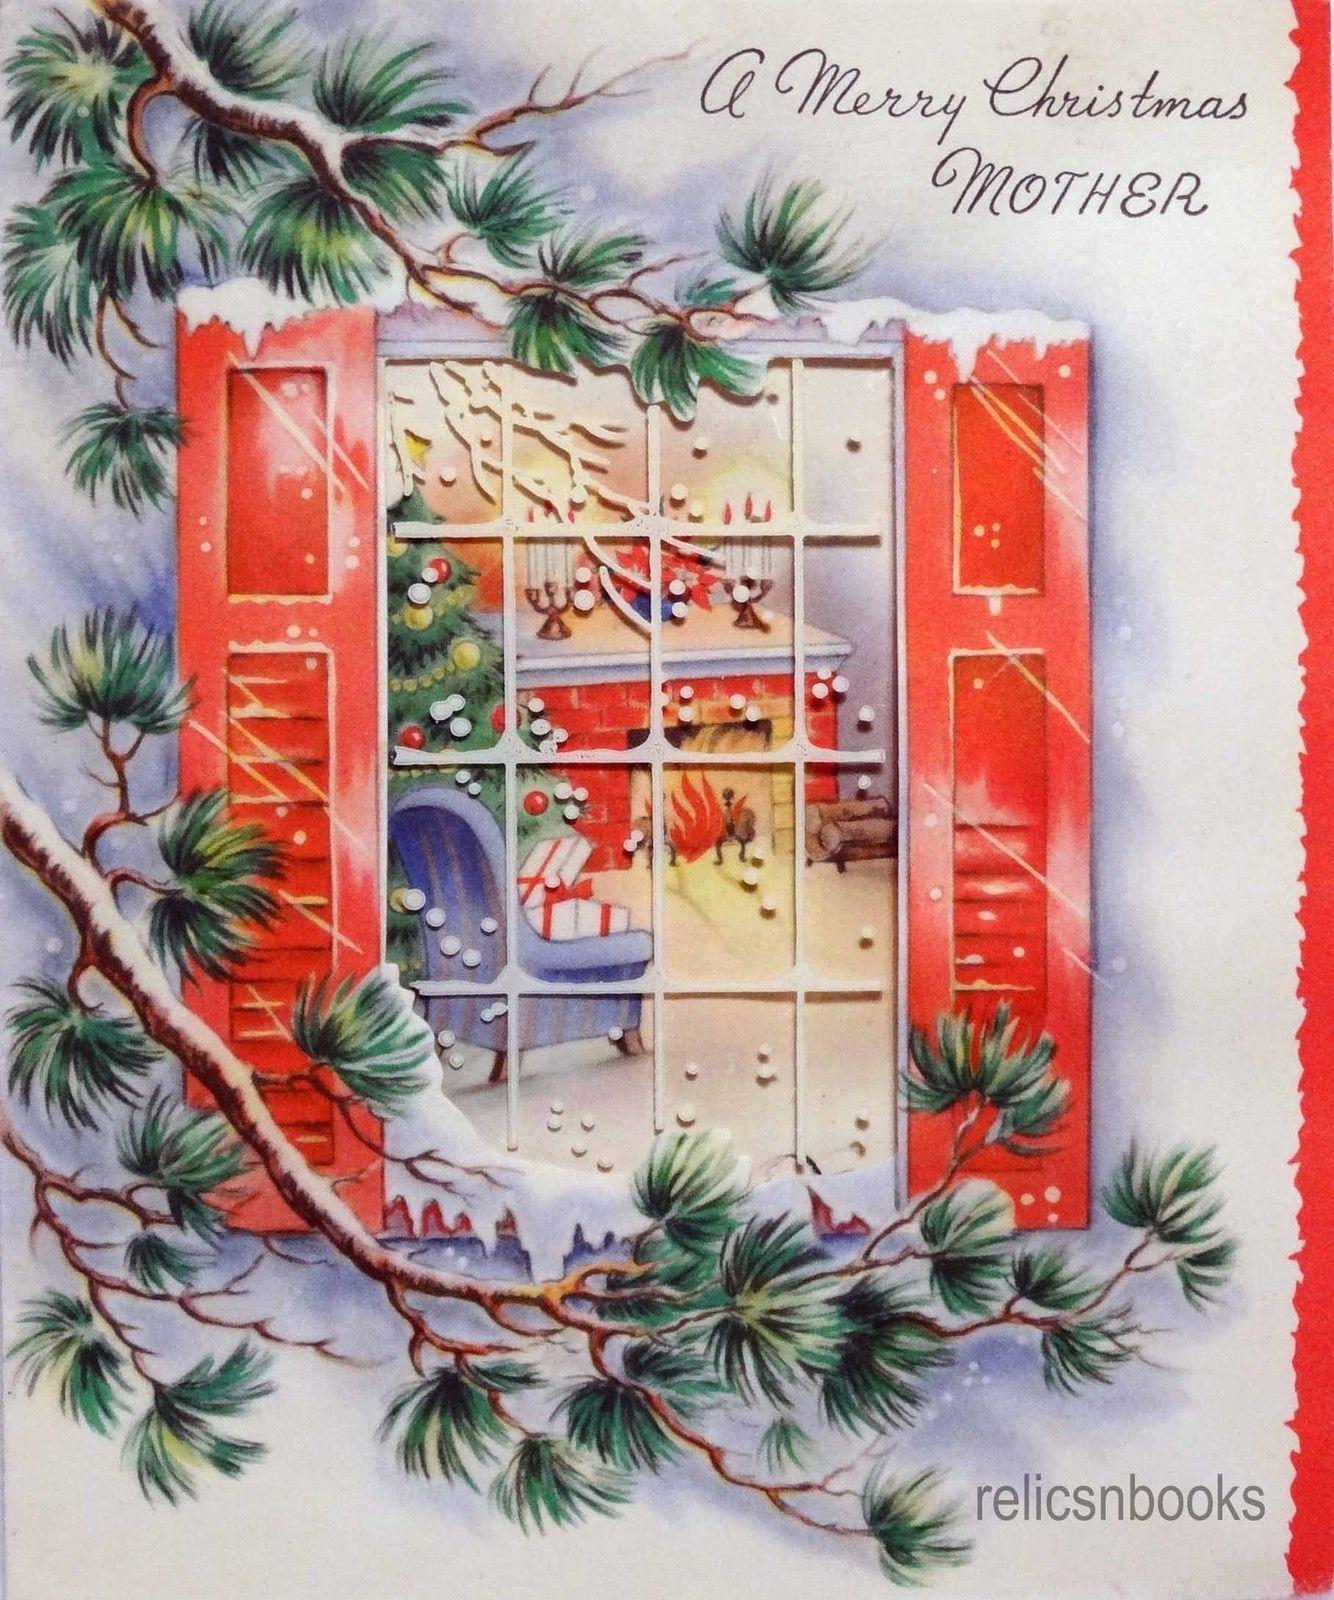 1066 50s through the window vintage christmas card greeting 1066 50s through the window vintage christmas card greeting kristyandbryce Choice Image